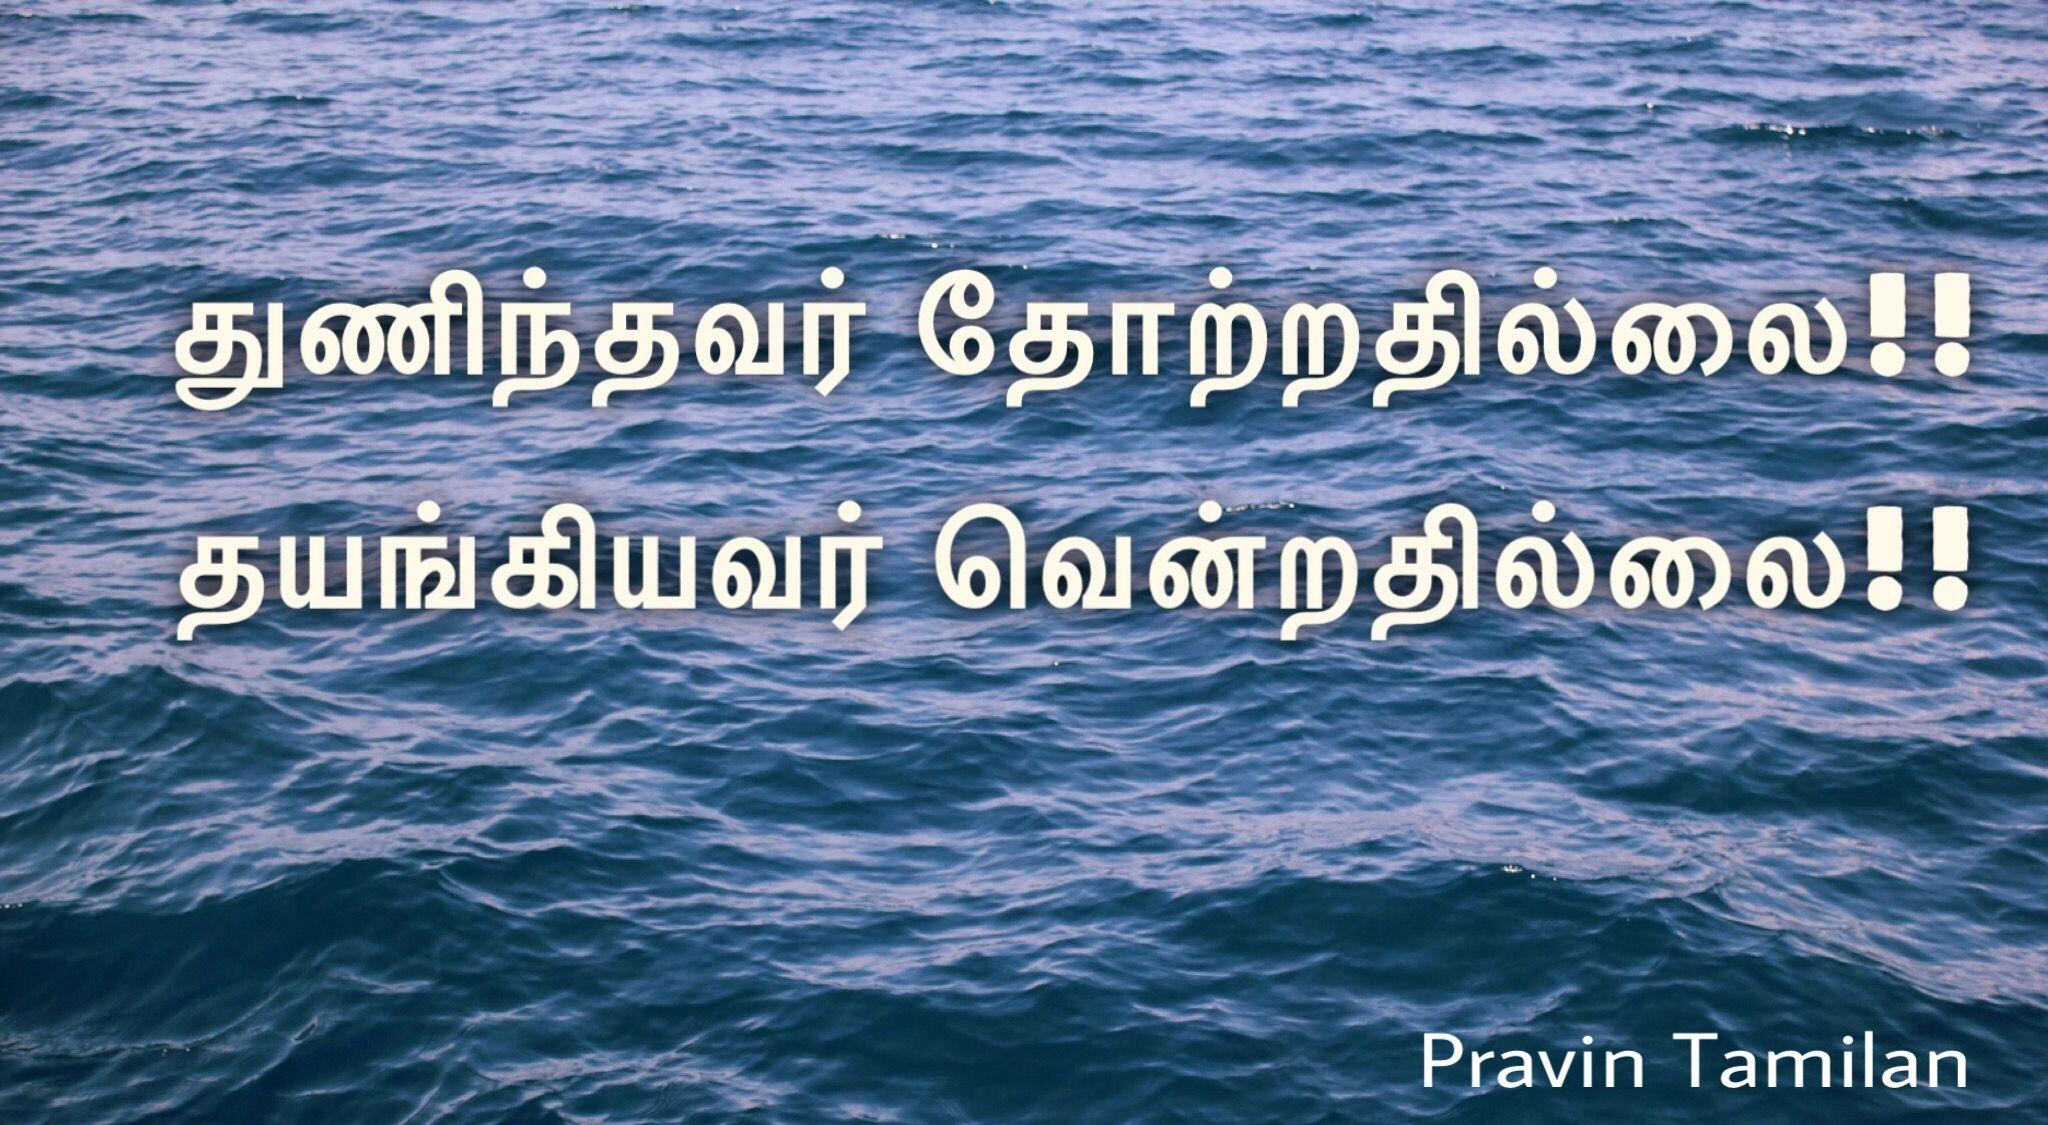 Screenshots Image By Pravin Tamilan On Tamil Kavithai